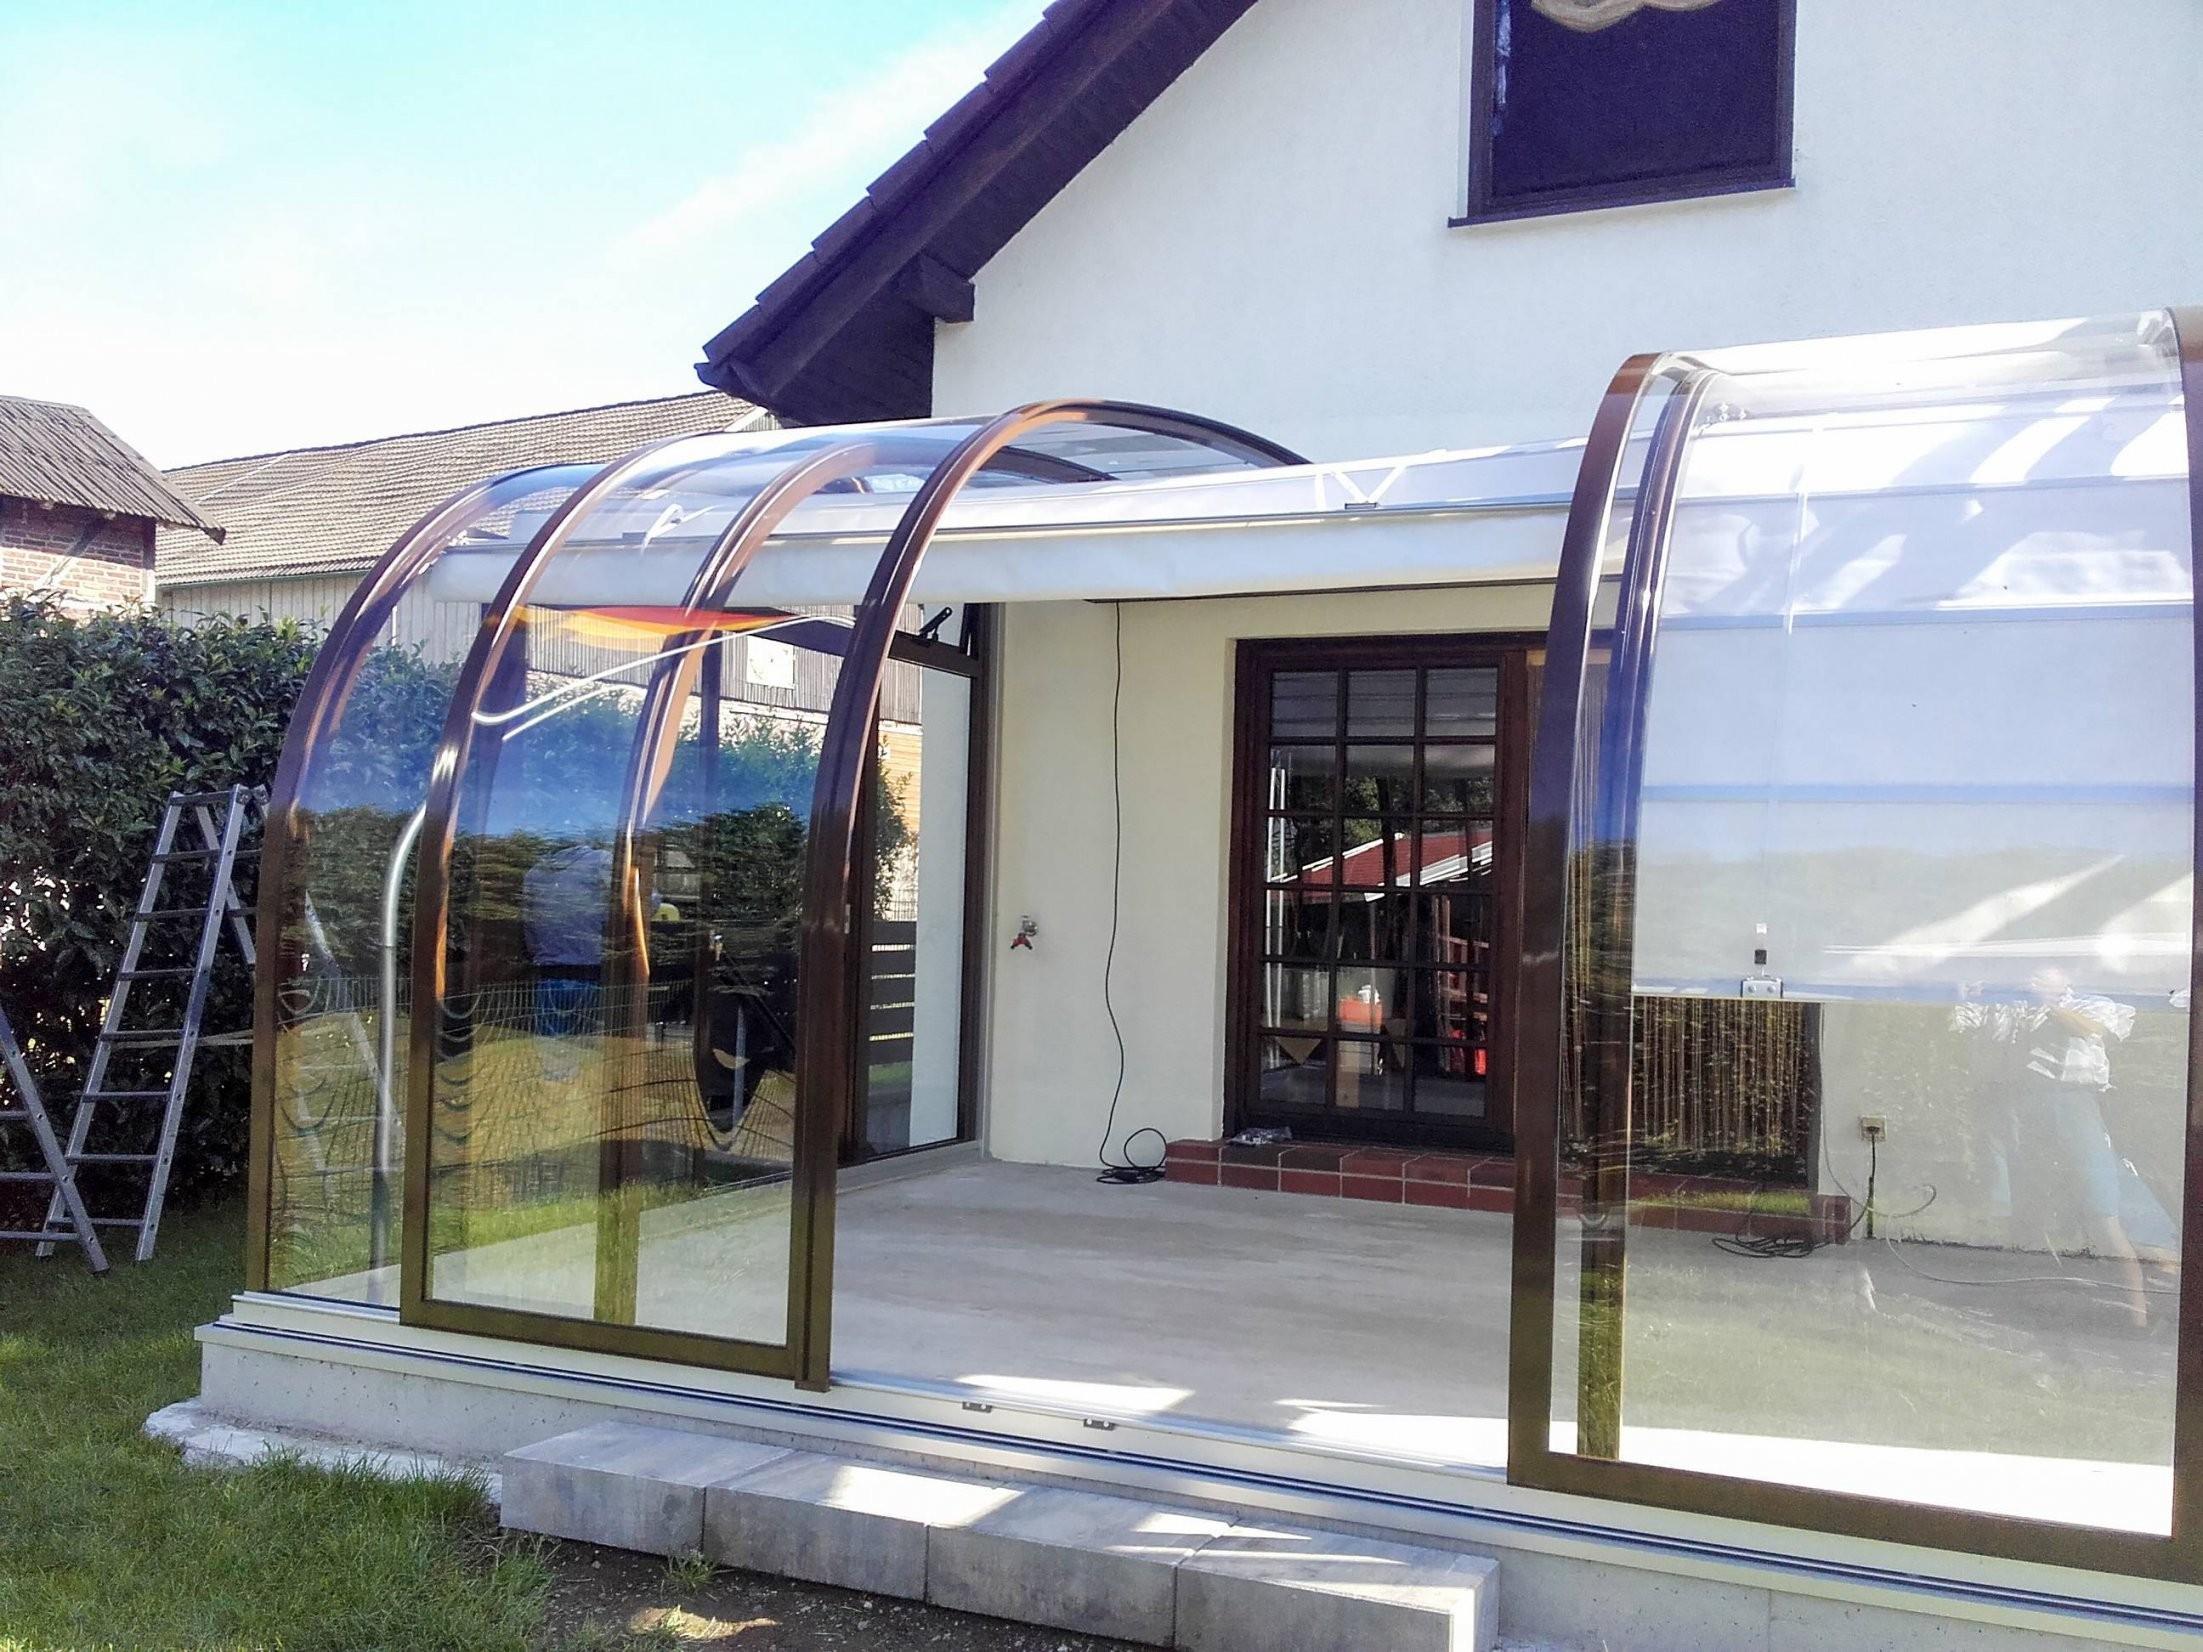 Terrassenüberdachung Selber Bauen Glas Innerhalb 35 Oberteil von Terrassenüberdachung Selber Bauen Glas Photo